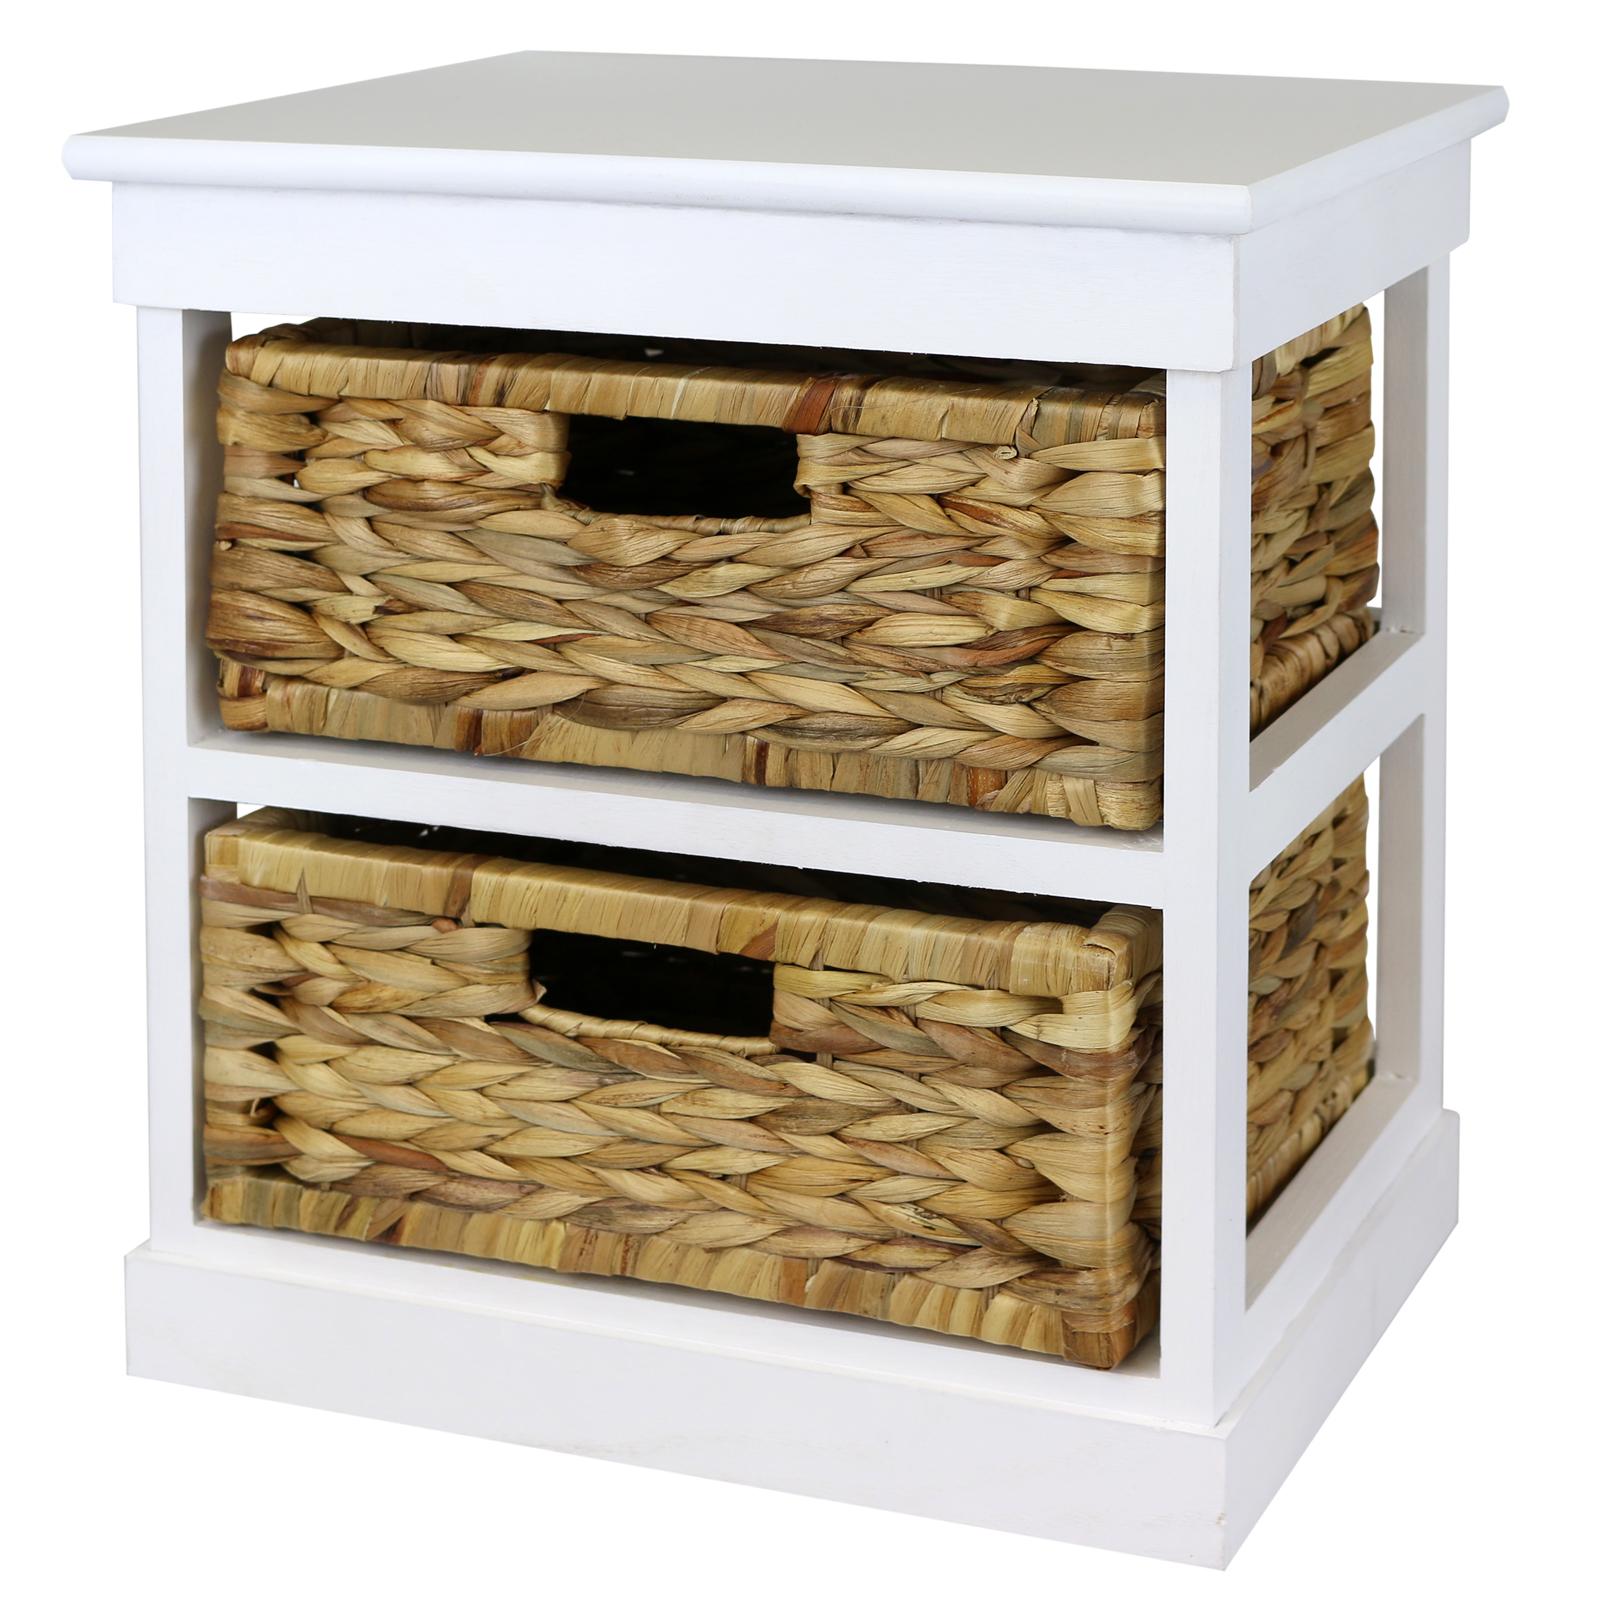 Basket Storage With Drawers Cabinets ~ Hartleys white basket bedside table home storage unit